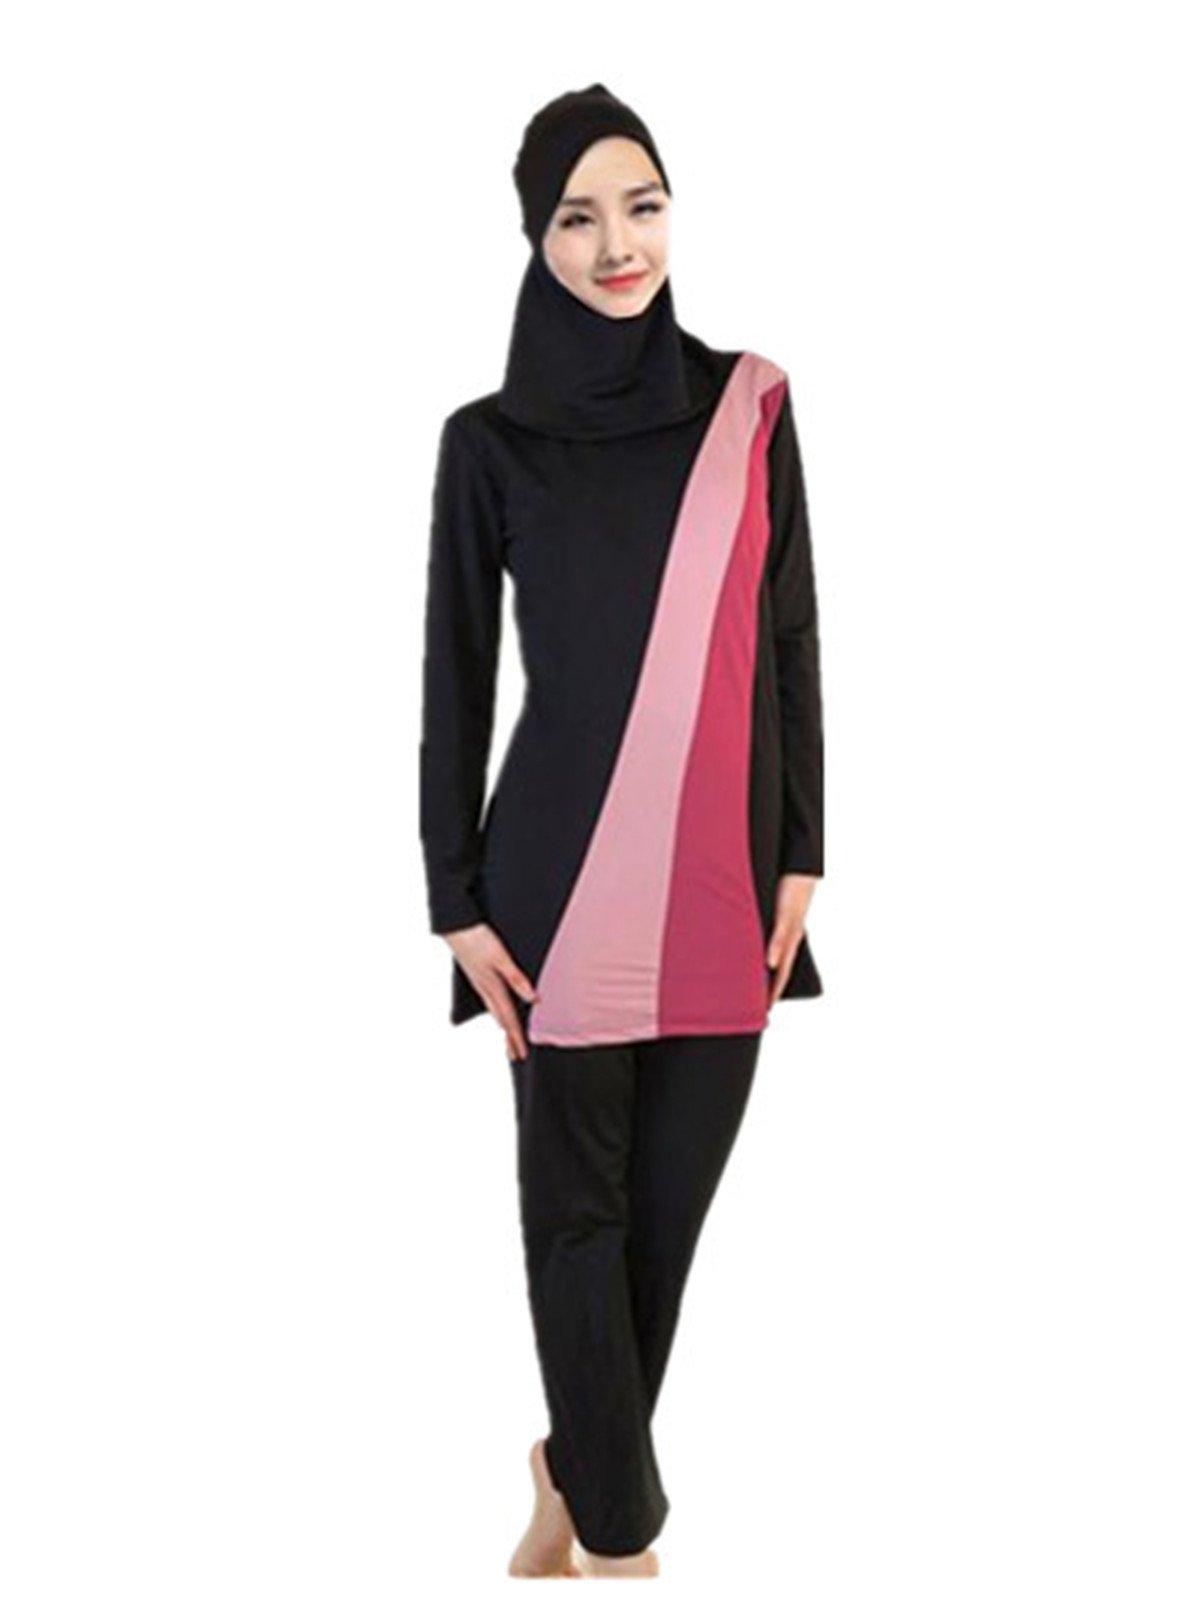 Leright Women's Muslim Swimsuit Color Block Moderate 2 Piece Beachwear Burkini, Black, XXXL(US Size XL)